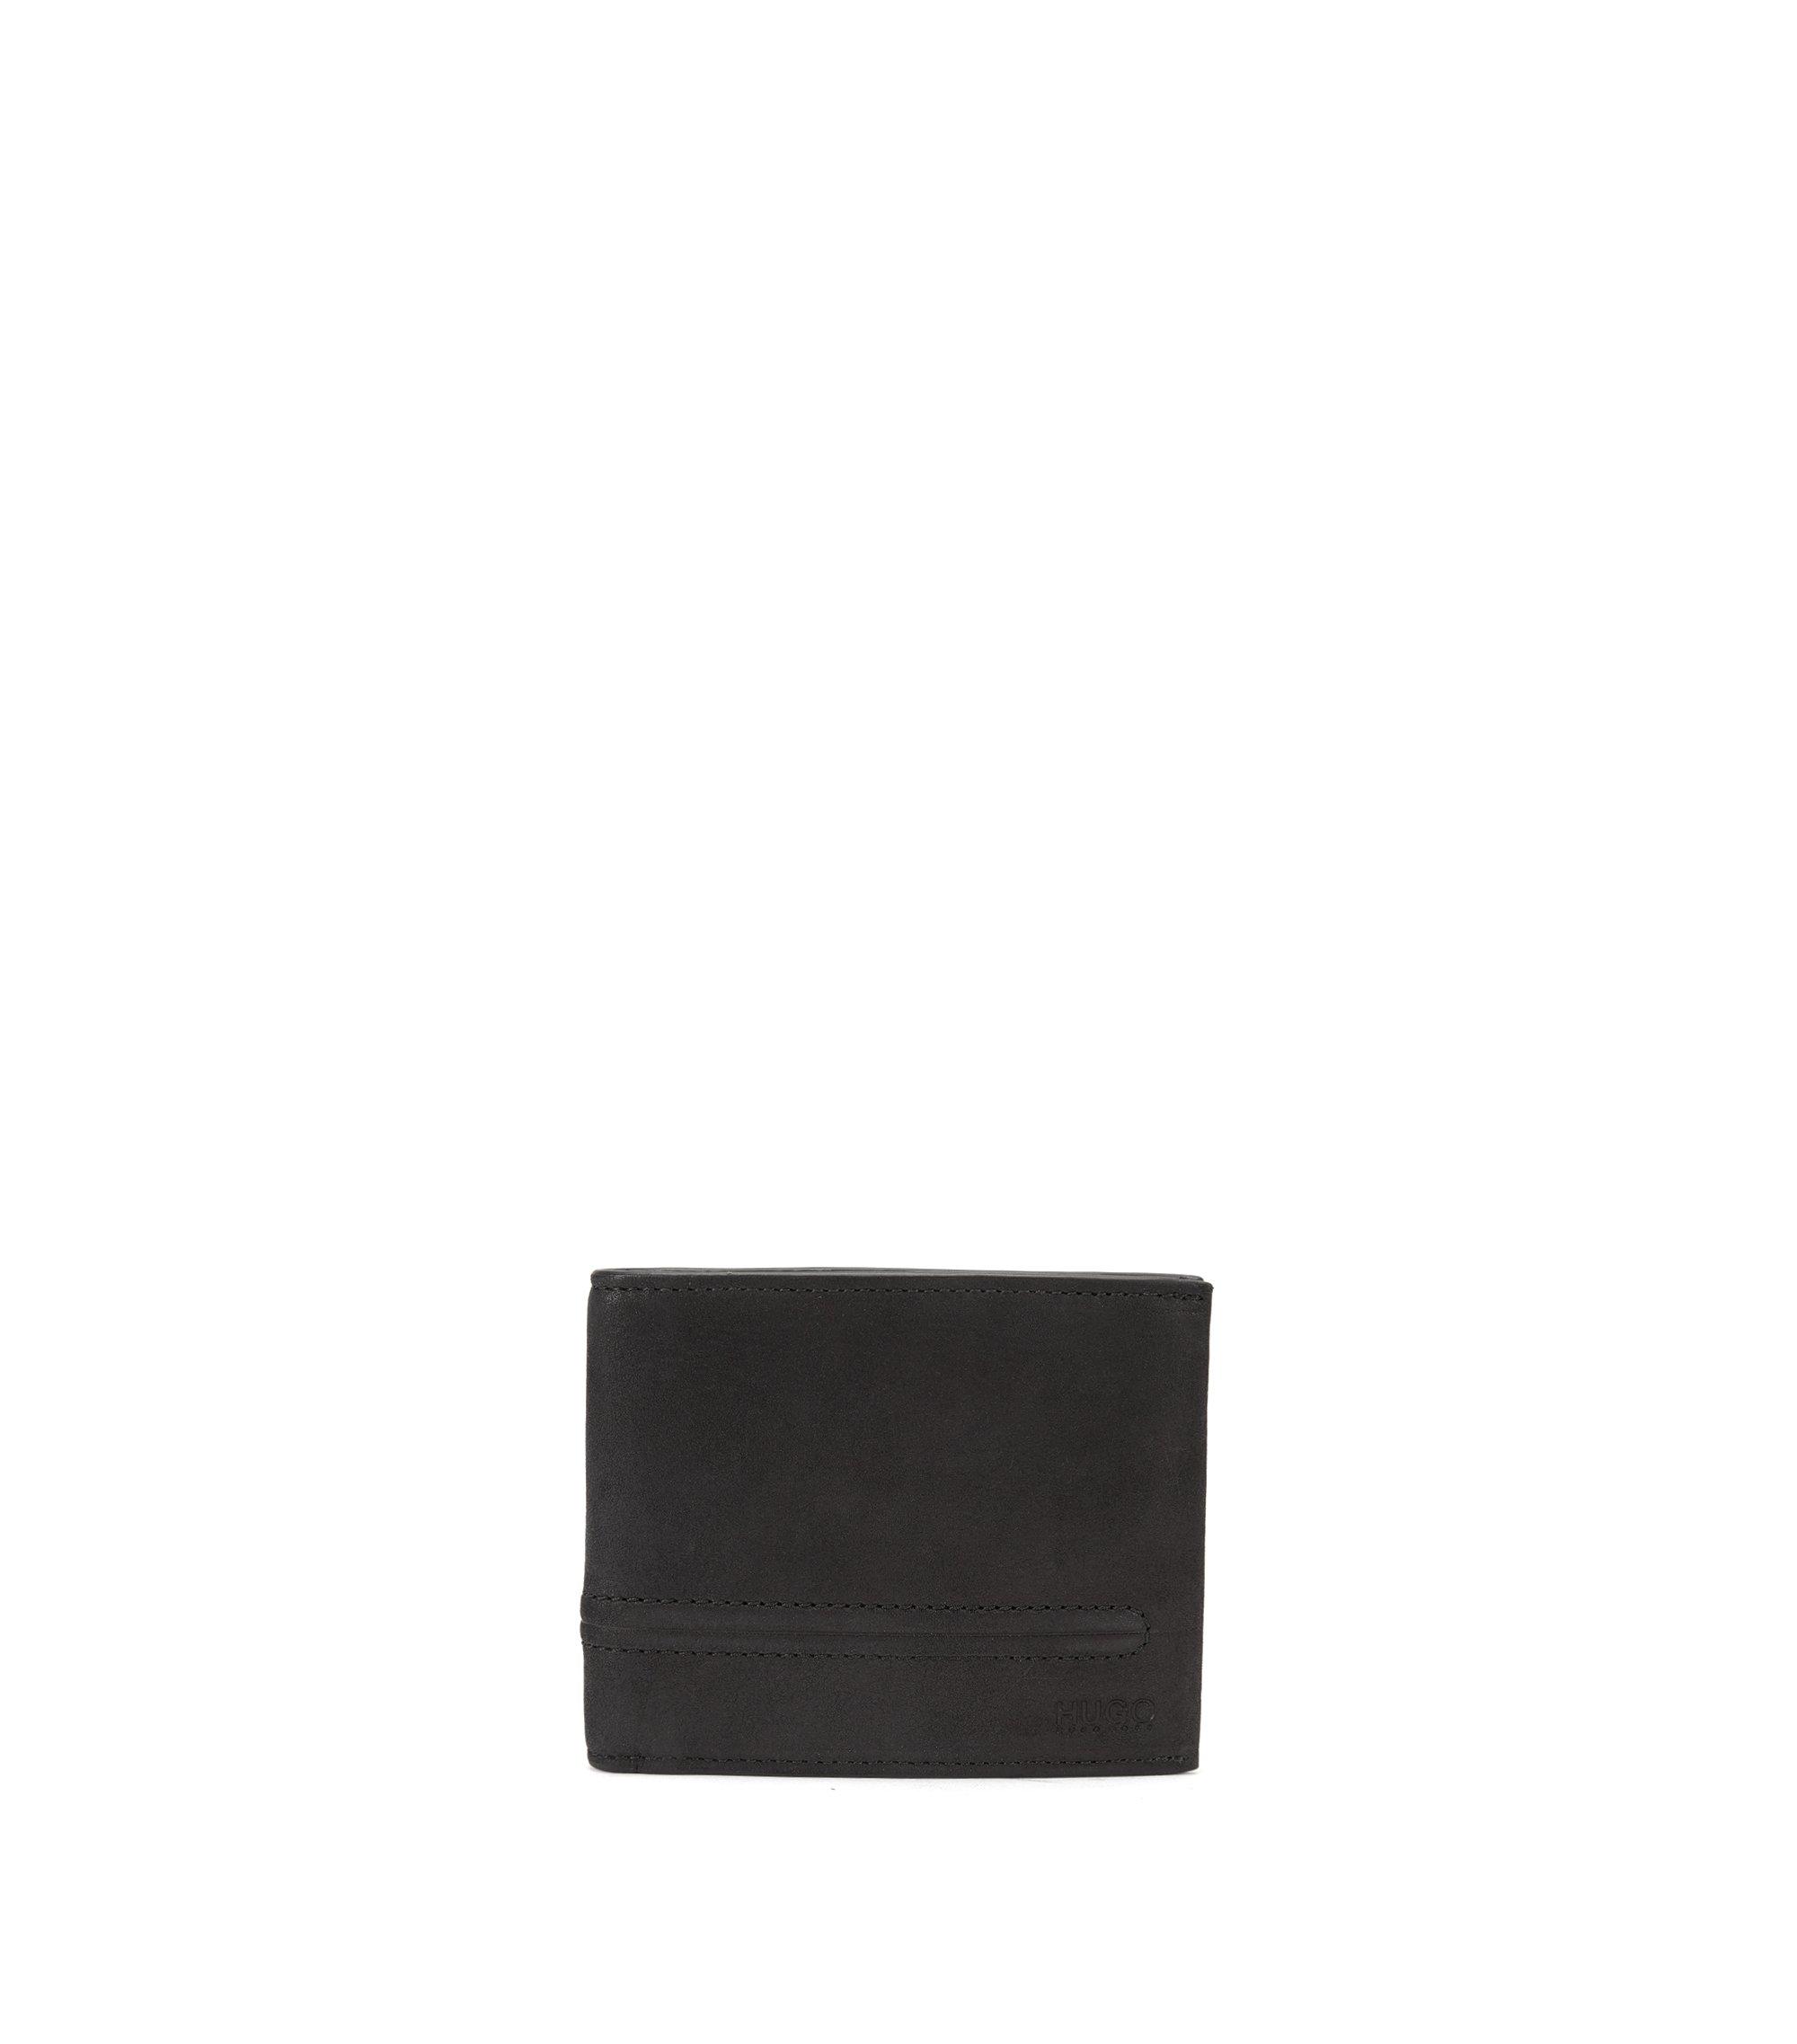 Bifold wallet in soft nubuck leather, Black